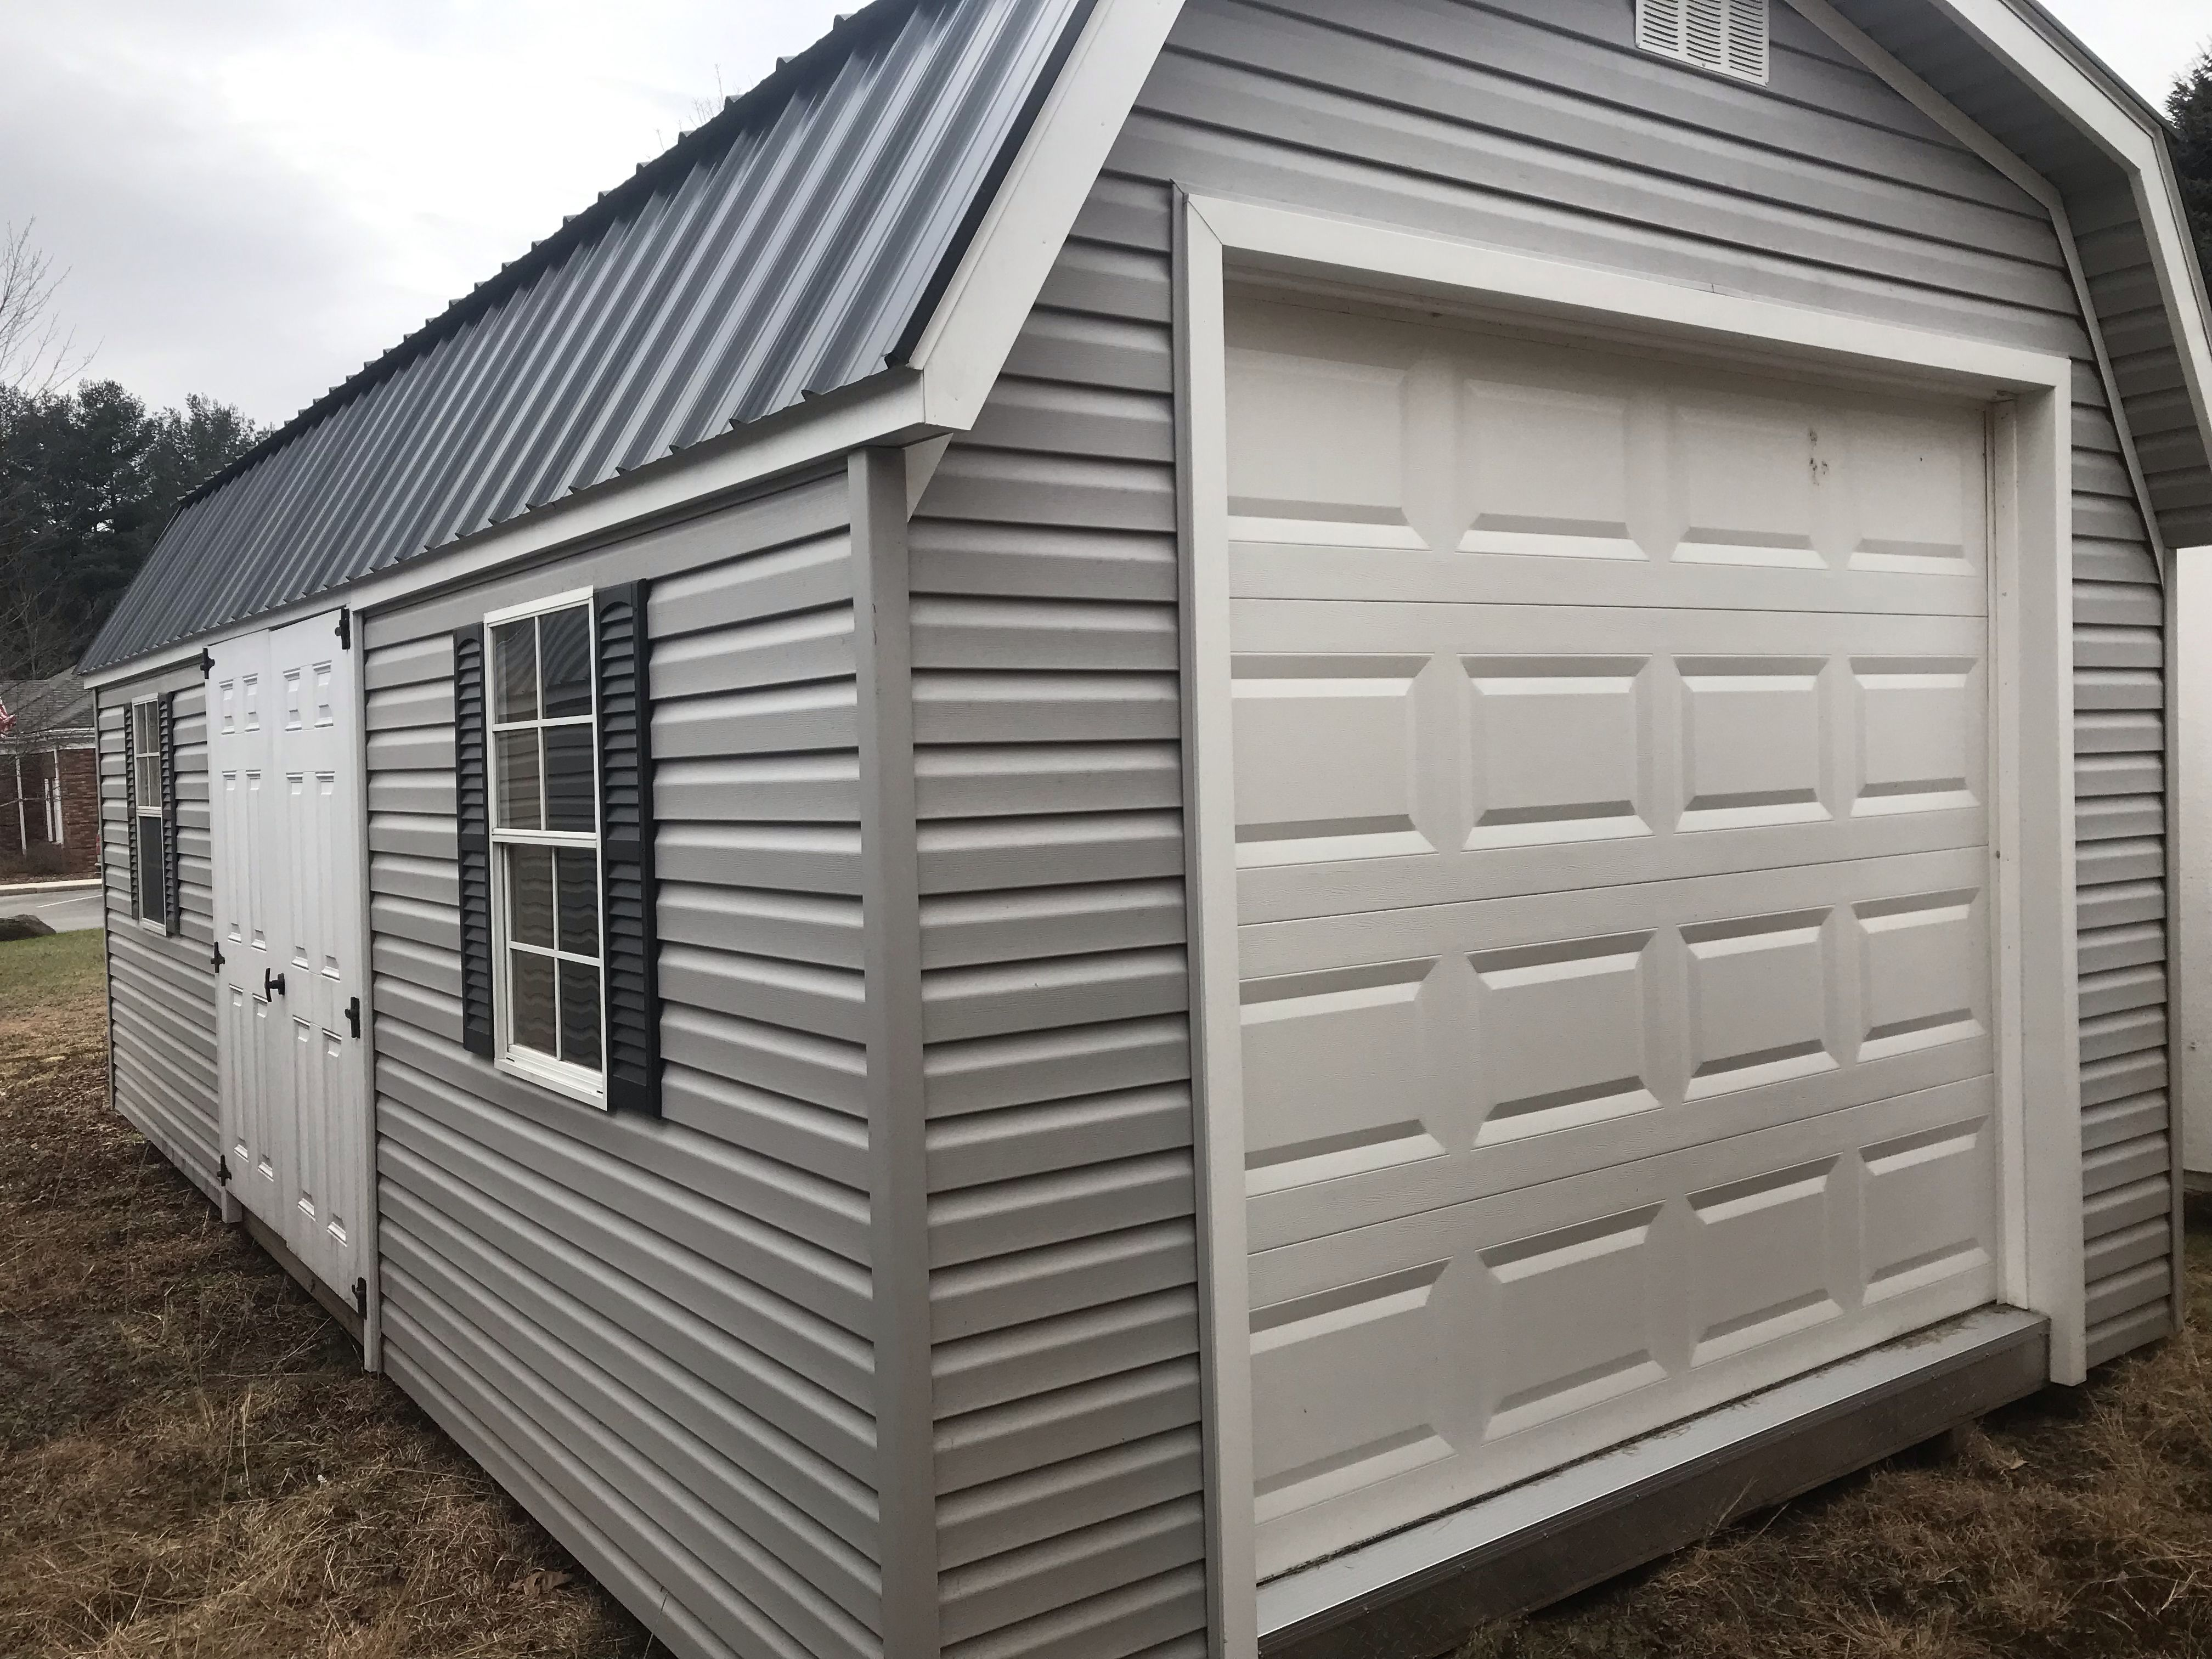 12 X 24 Vinyl Barn Shed Vinyl Siding Overhead Door